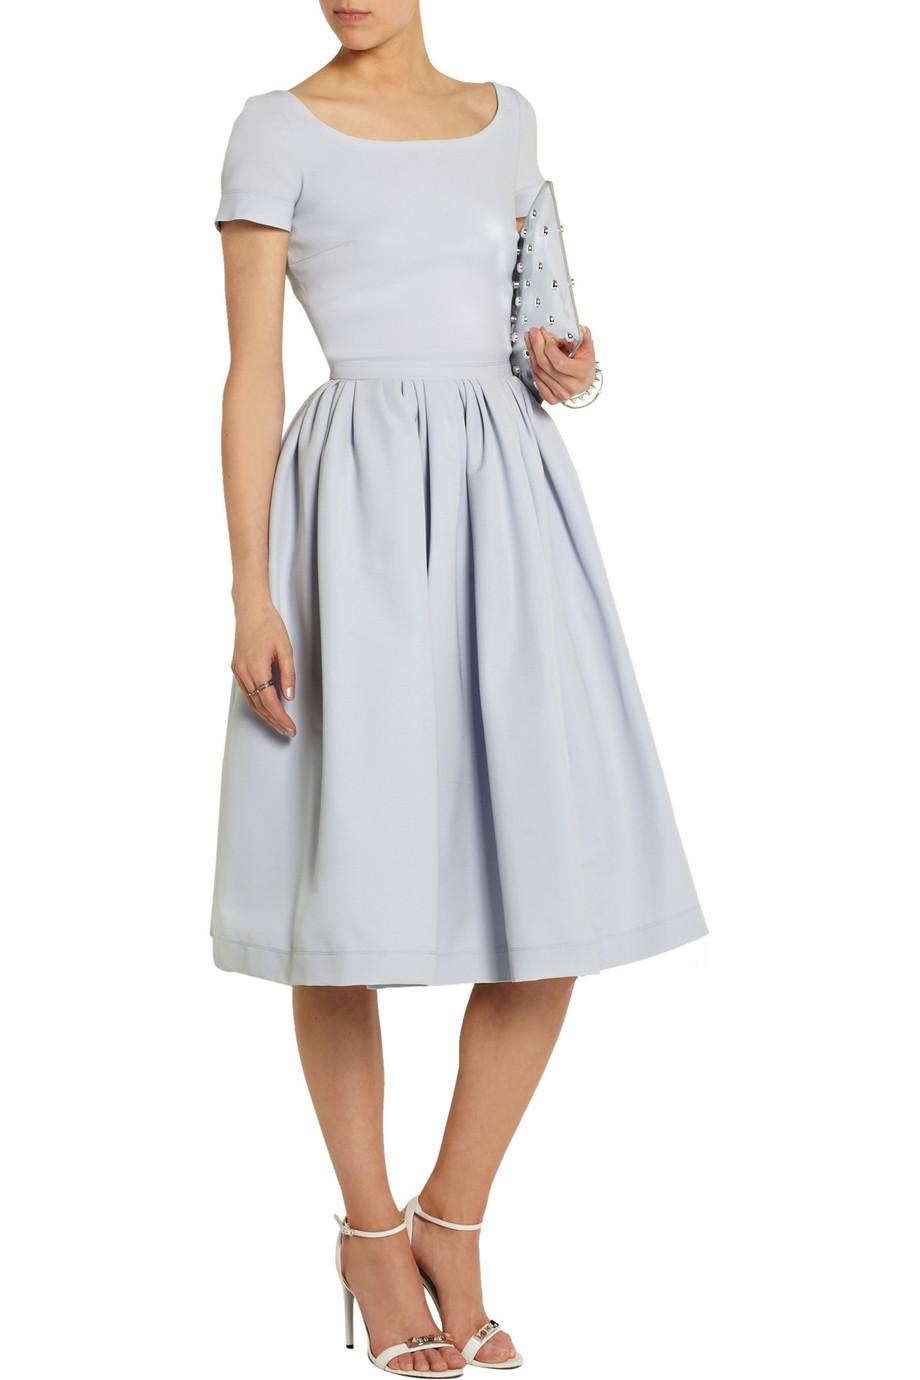 Preen Everly Dress